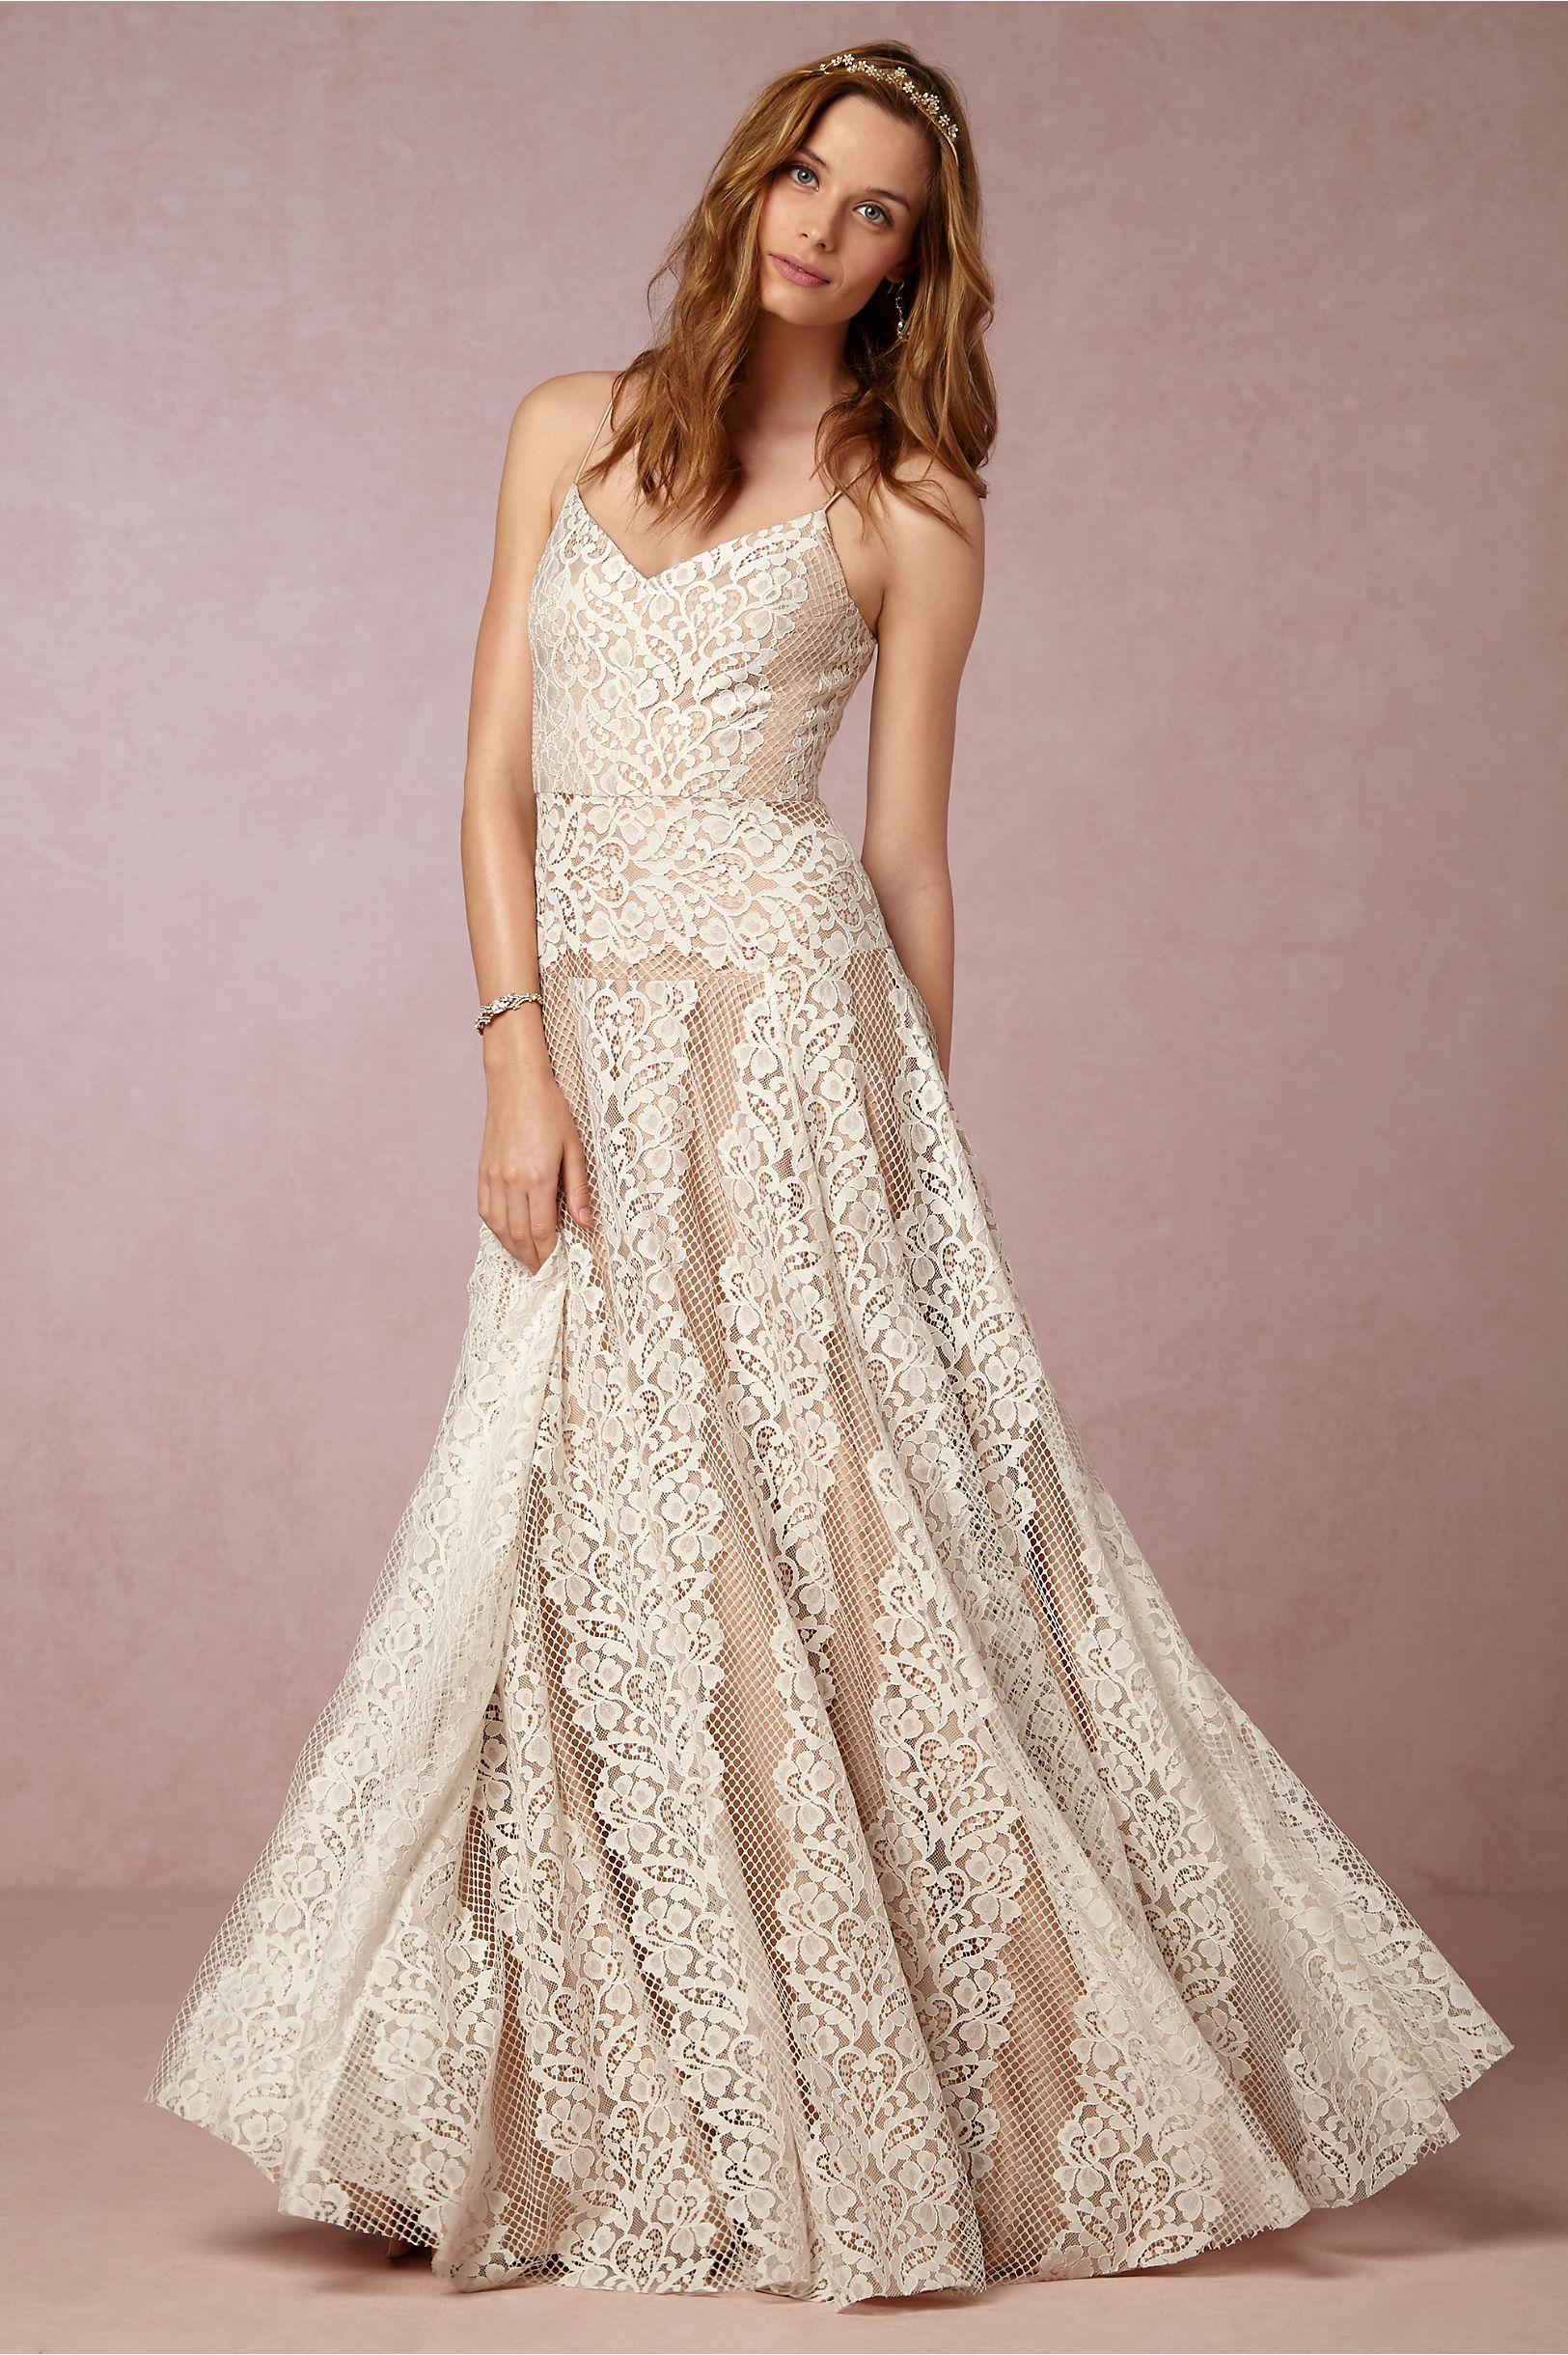 Larkin Gown in Sale | BHLDN